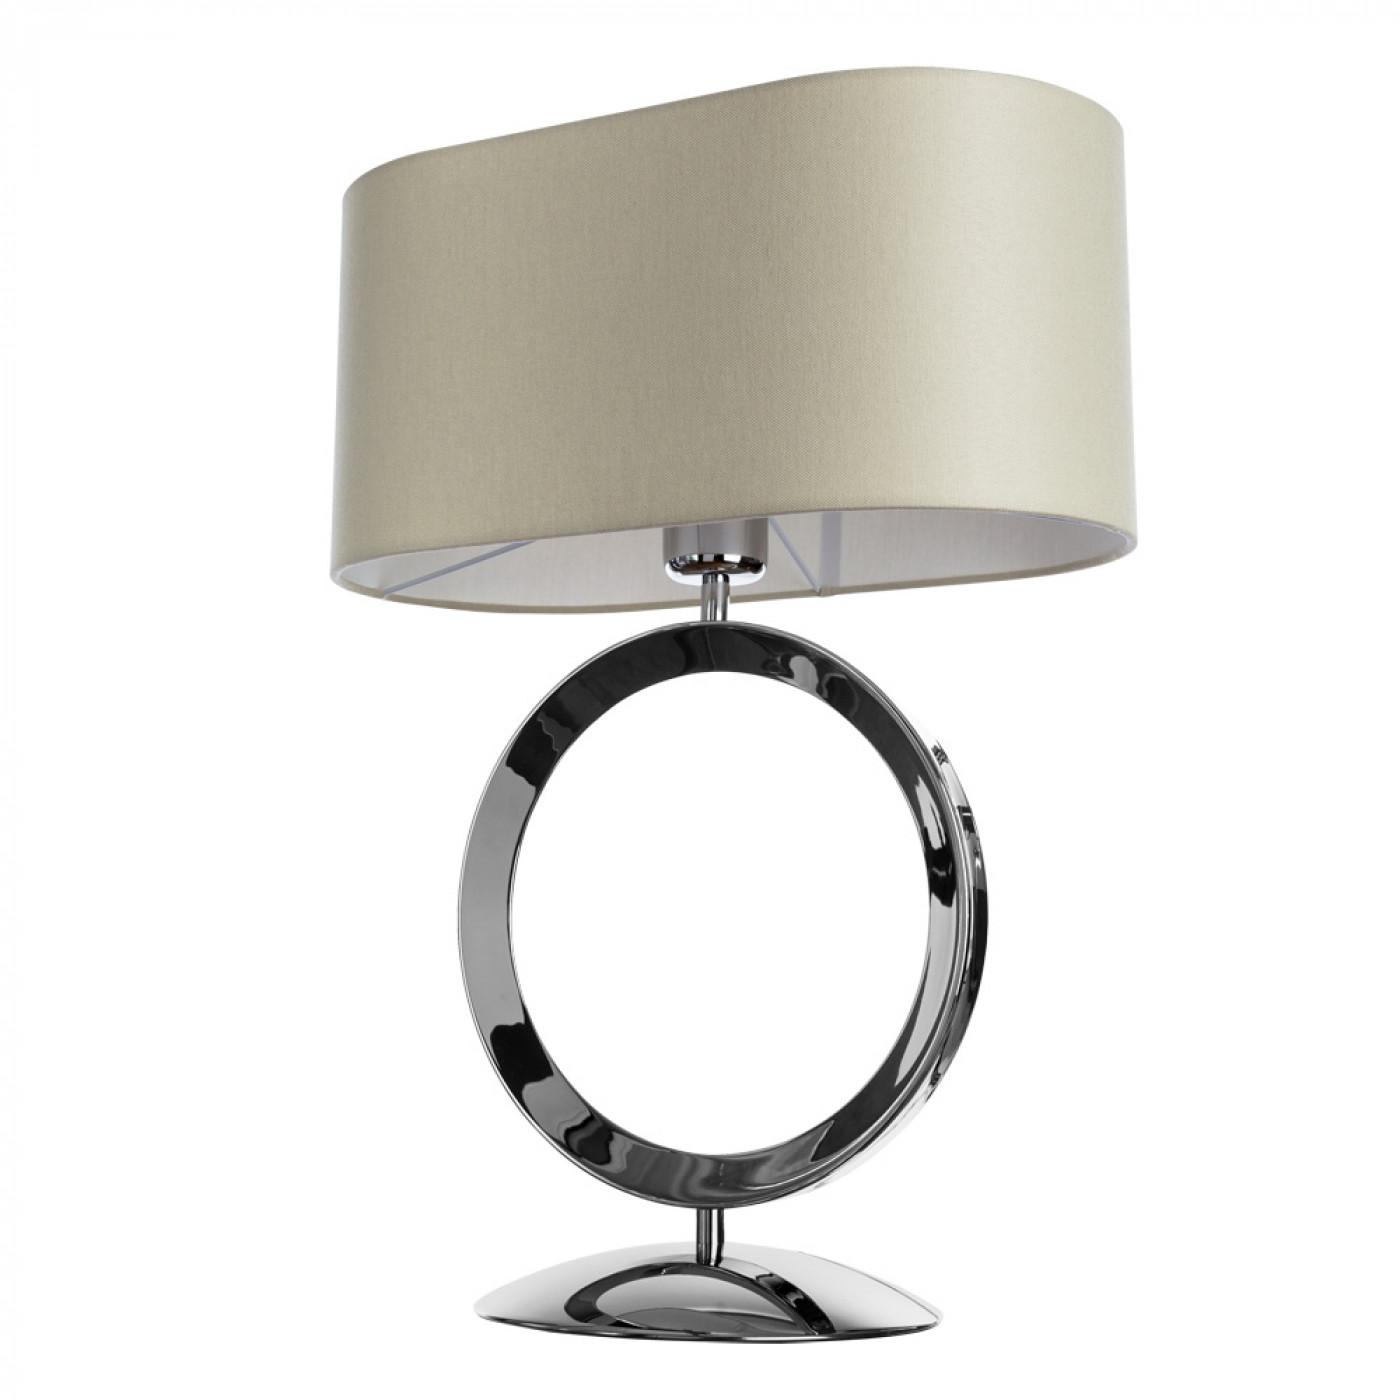 Настольная лампа Divinare Contralto 4069/02 TL-1